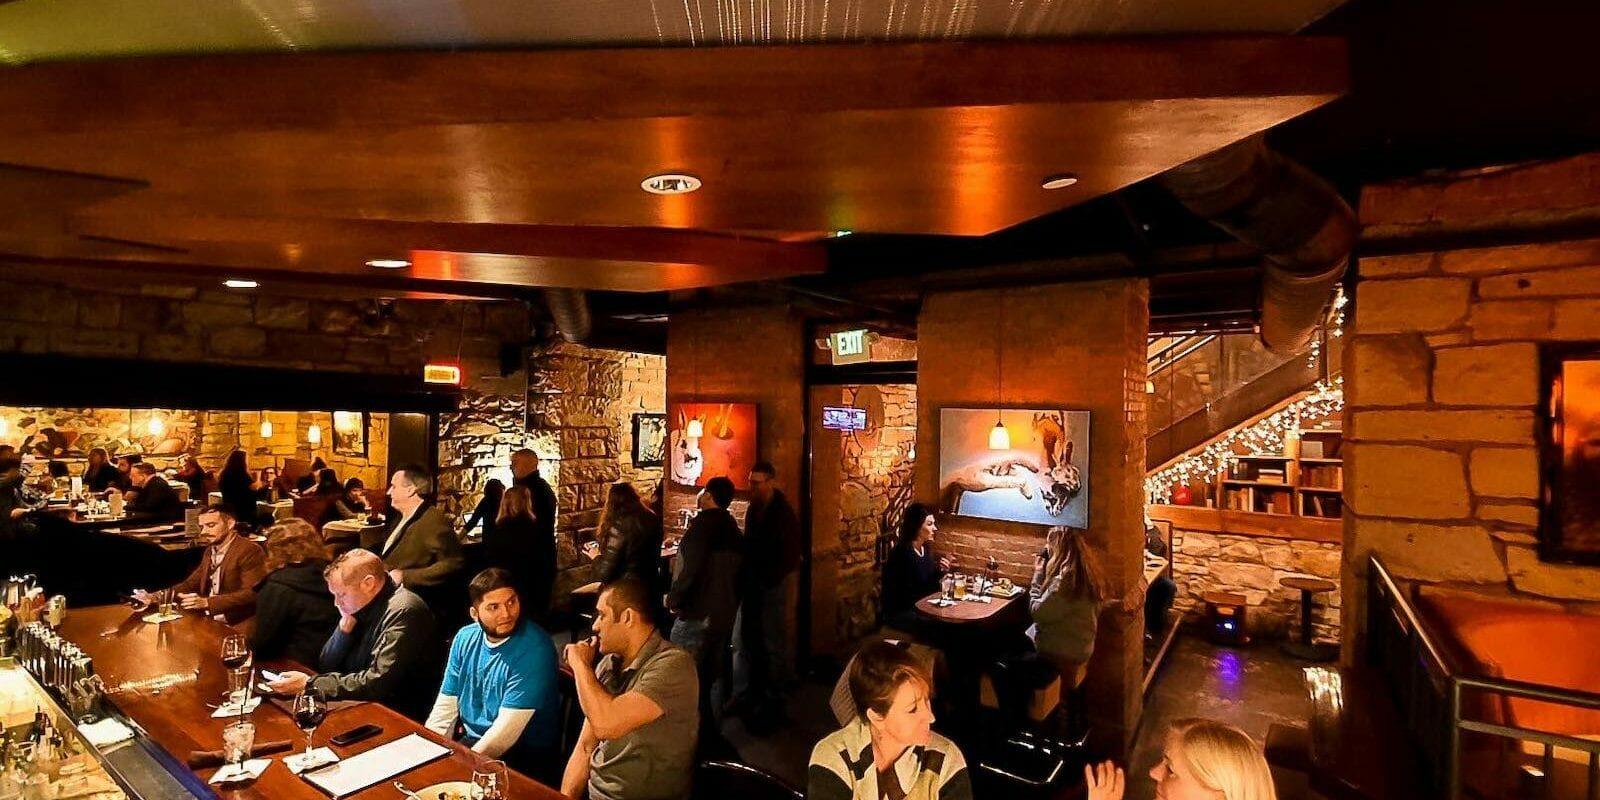 Best Colorado Springs Fine Dining Restaurants The Rabbit Hole Interior Bar